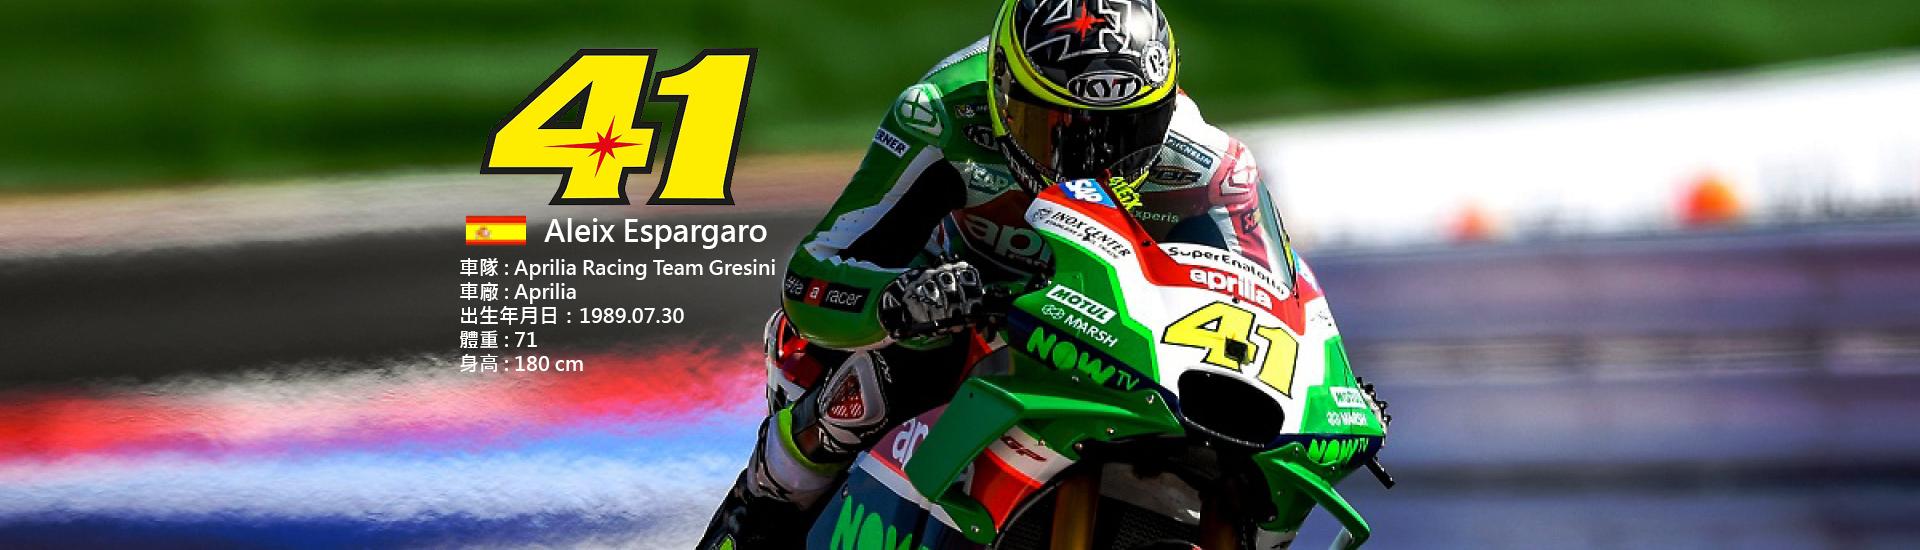 2018 MotoGP 【41】Aleix Espargaro